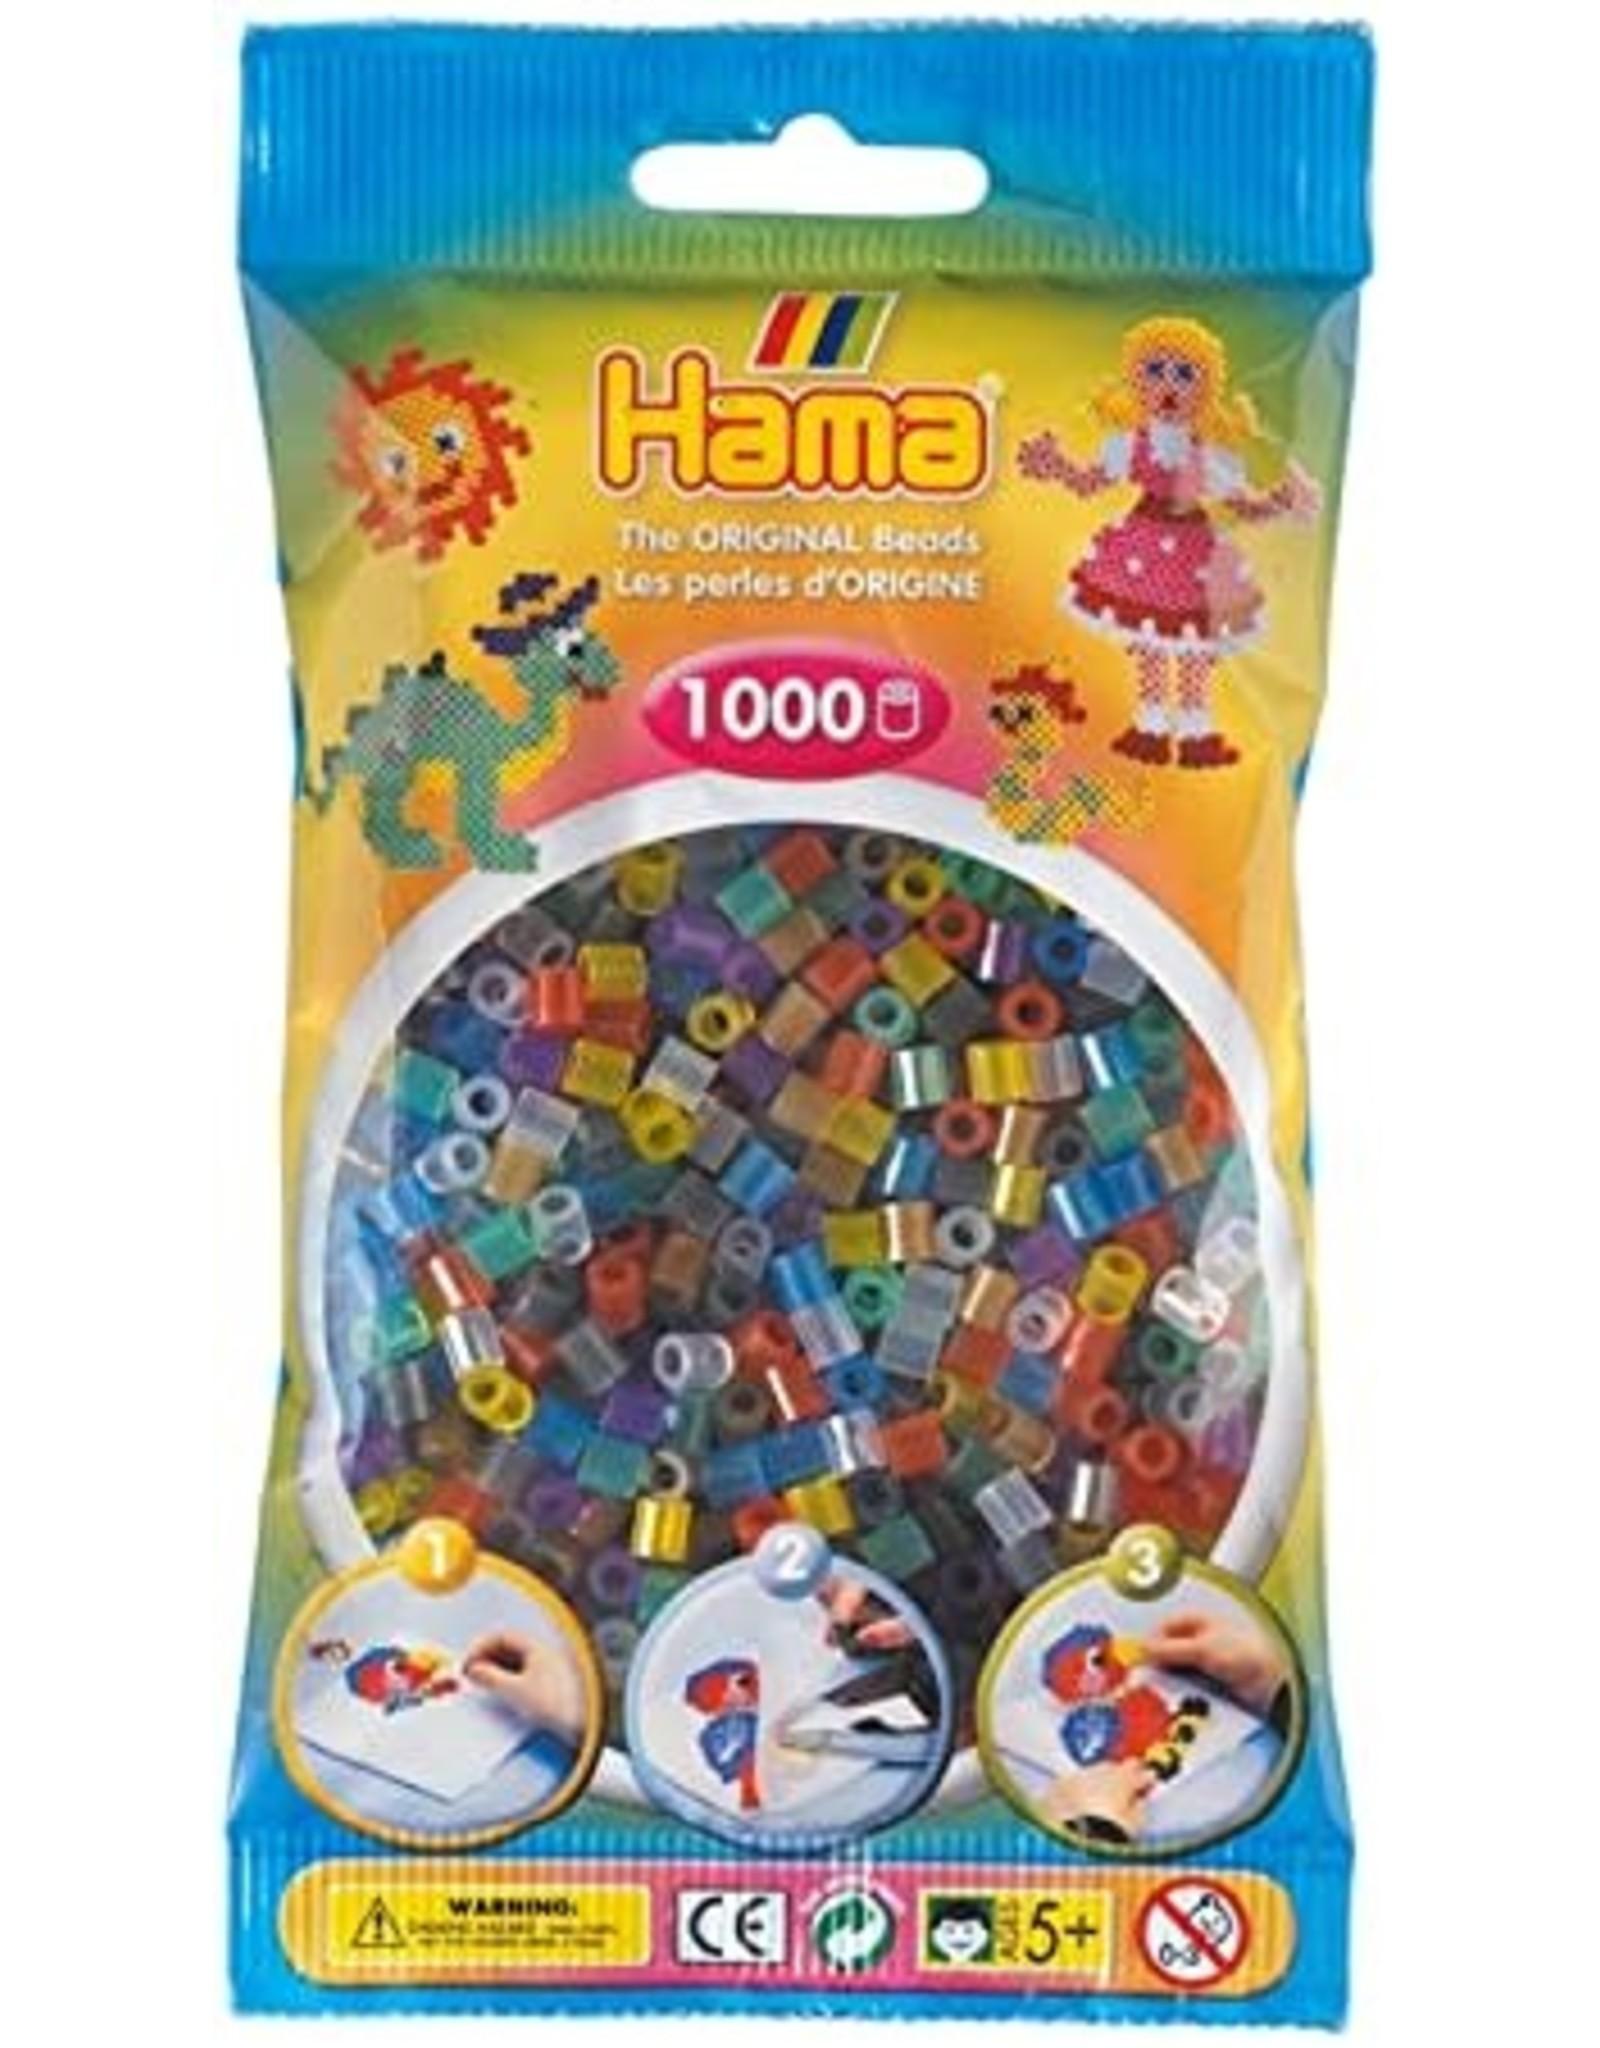 Hama Hama 1000 Translucent Mix Beads in Bag